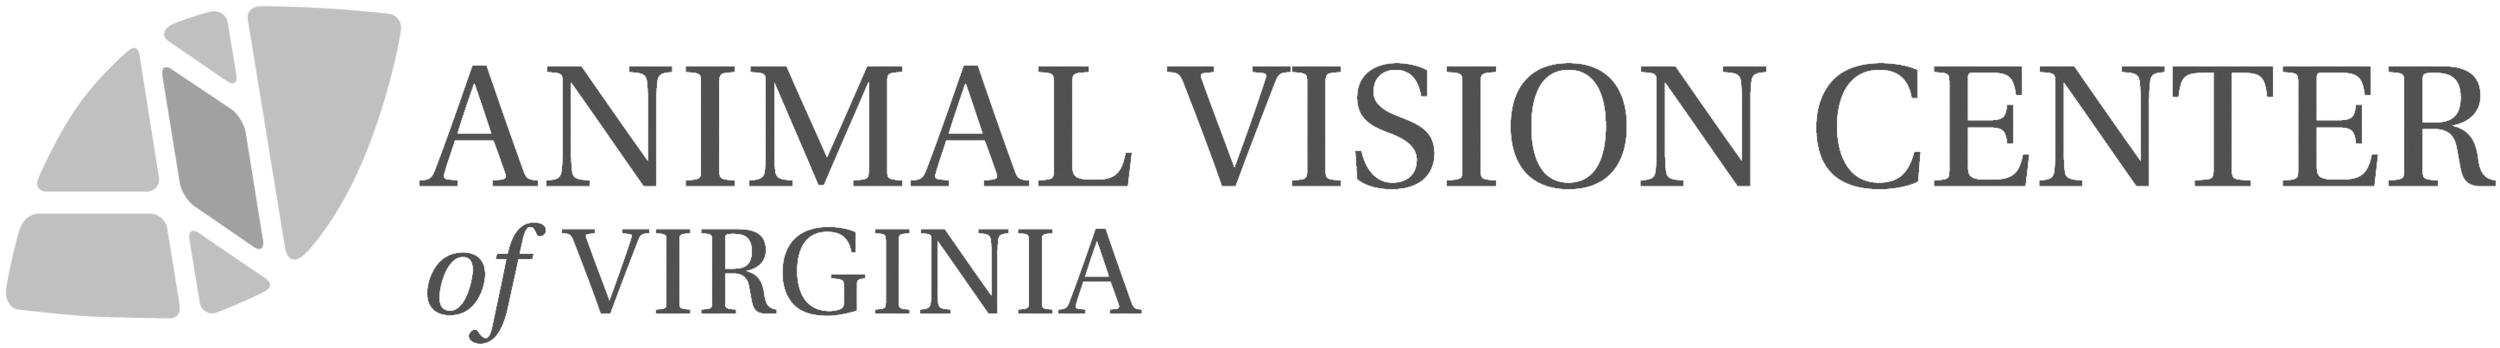 AVCVA-Logo-2Line-KWD-WEB.jpg